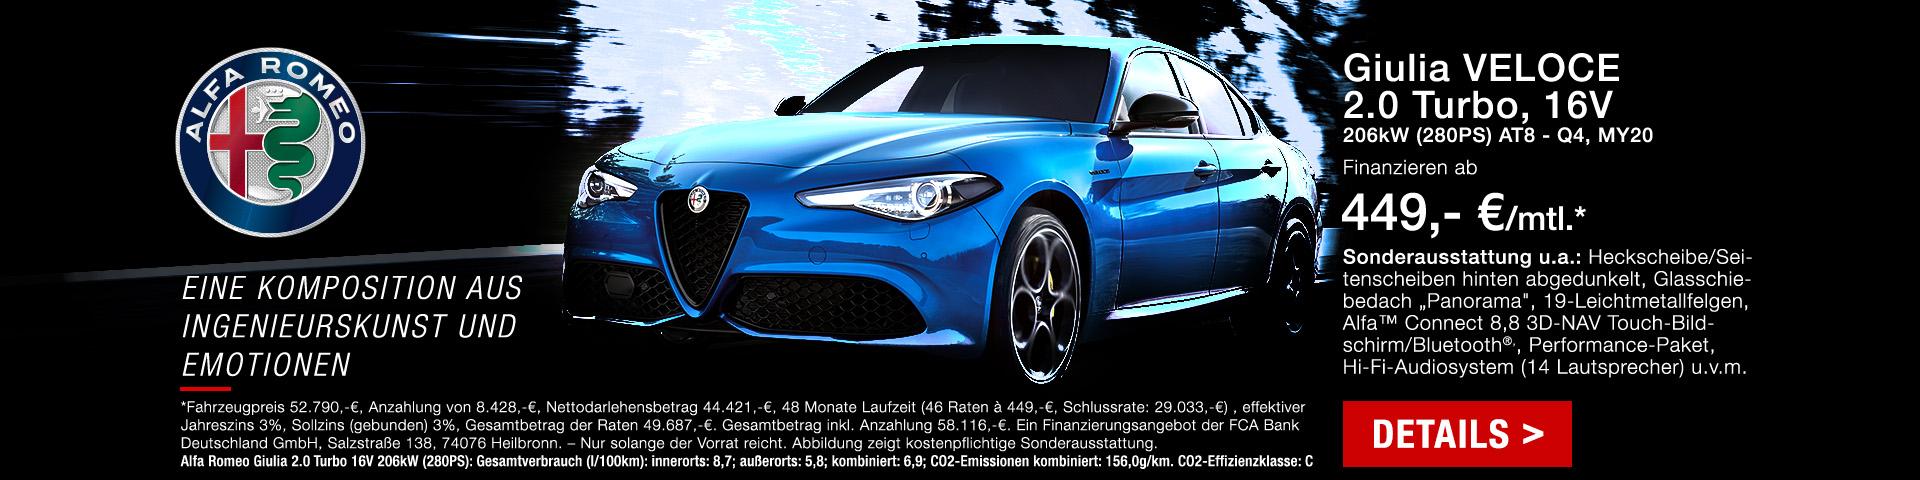 Alfa Romeo Giulia günstig bei Preckel Automobile